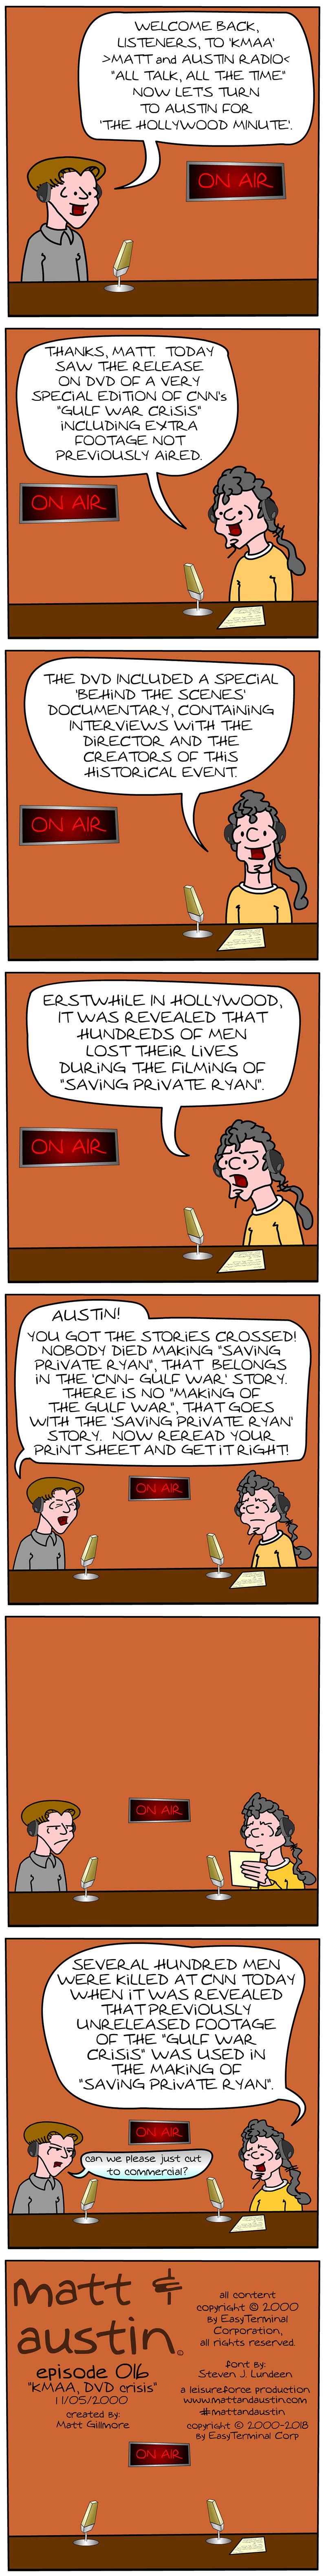 Webcomic The Matt And Austin Comic Strip #016 KMAA DVD Crisis